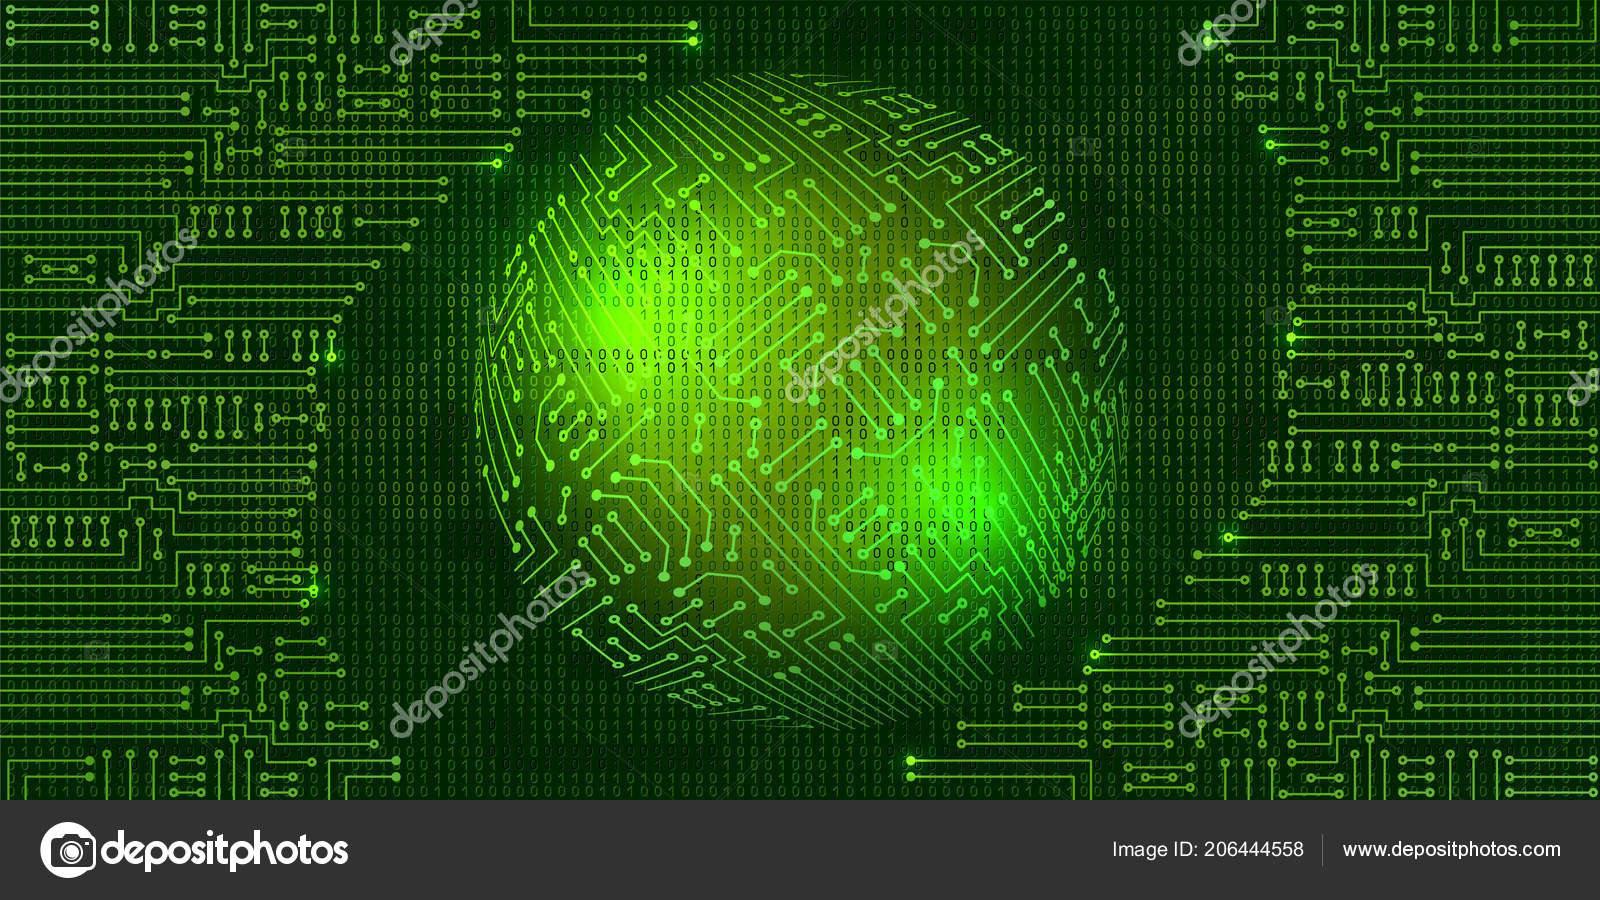 Kresba Moderni Elektronicky Obvod Binarni Kod Koule Stock Vektor